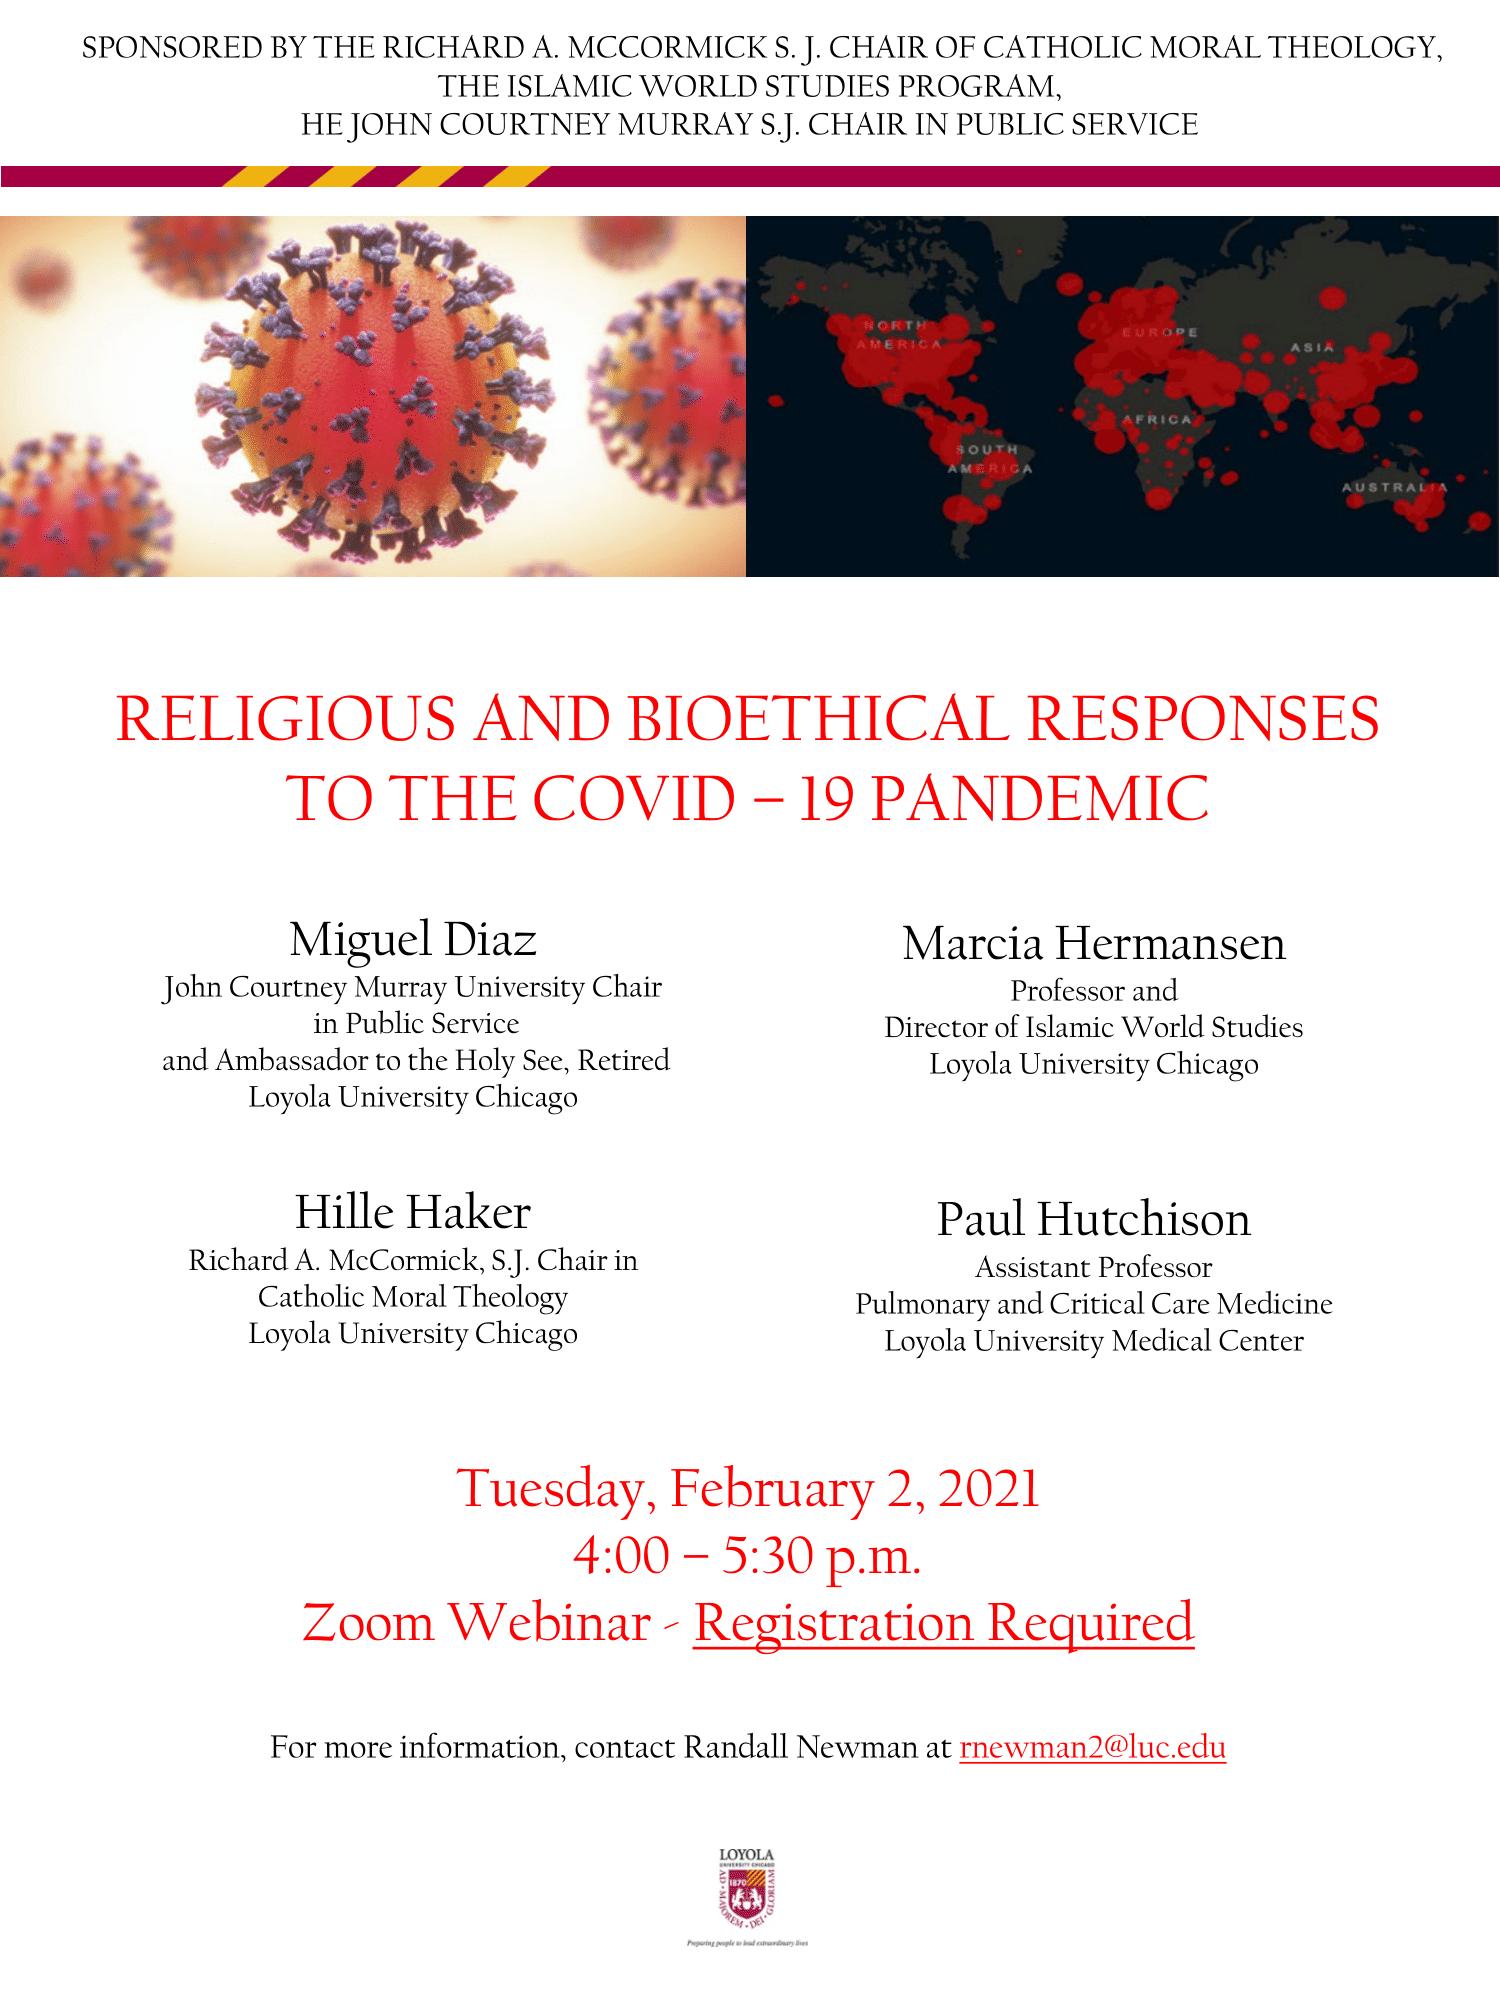 https://www.luc.edu/theology/homenews/covid19.shtml